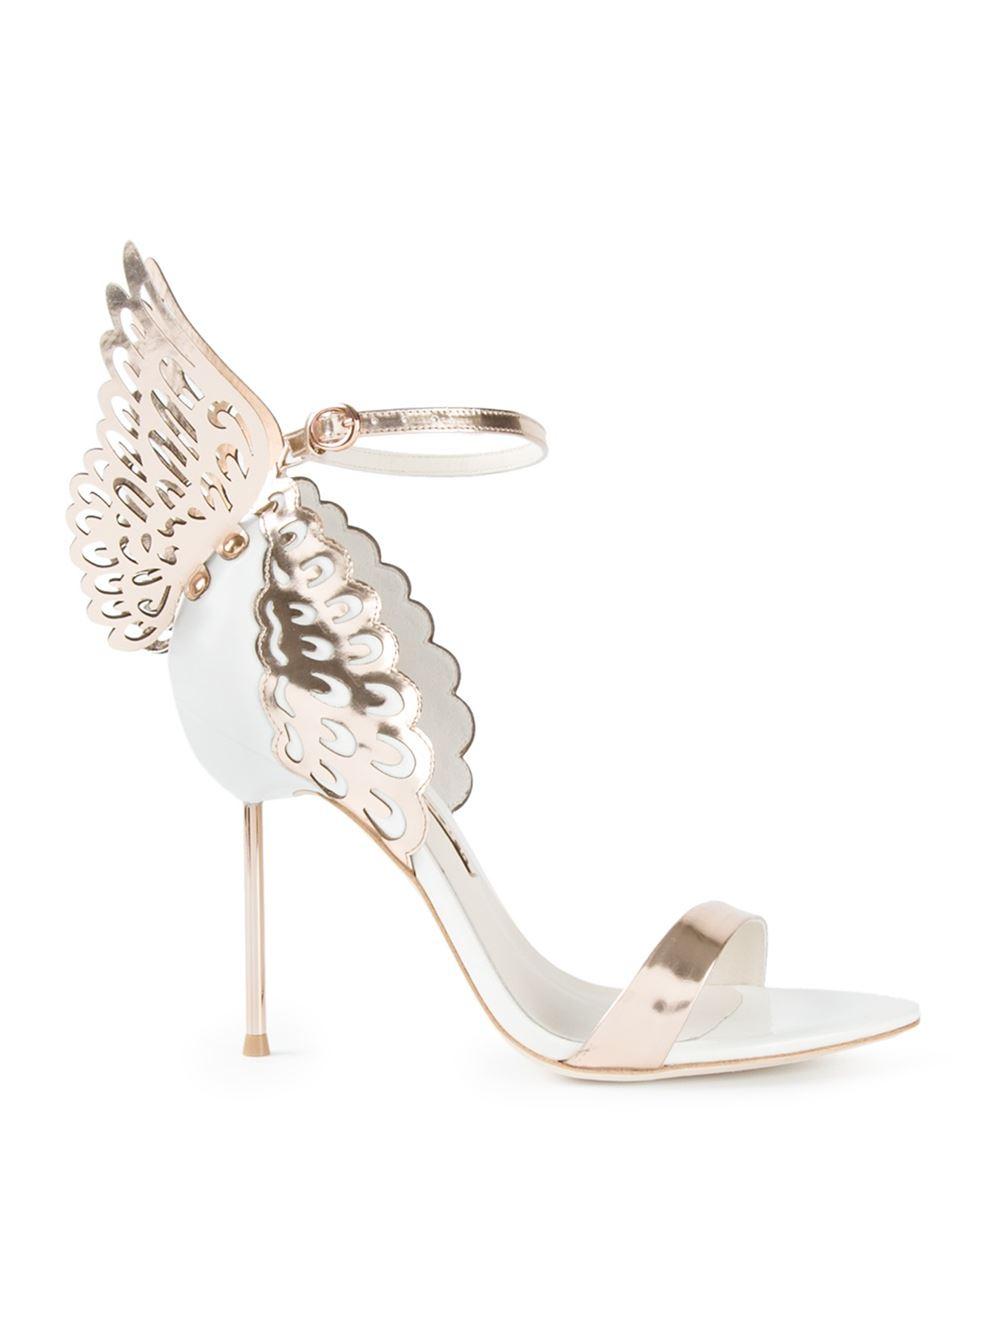 Sophia webster 39 evangeline 39 sandals in metallic lyst for Sophia webster wedding shoes